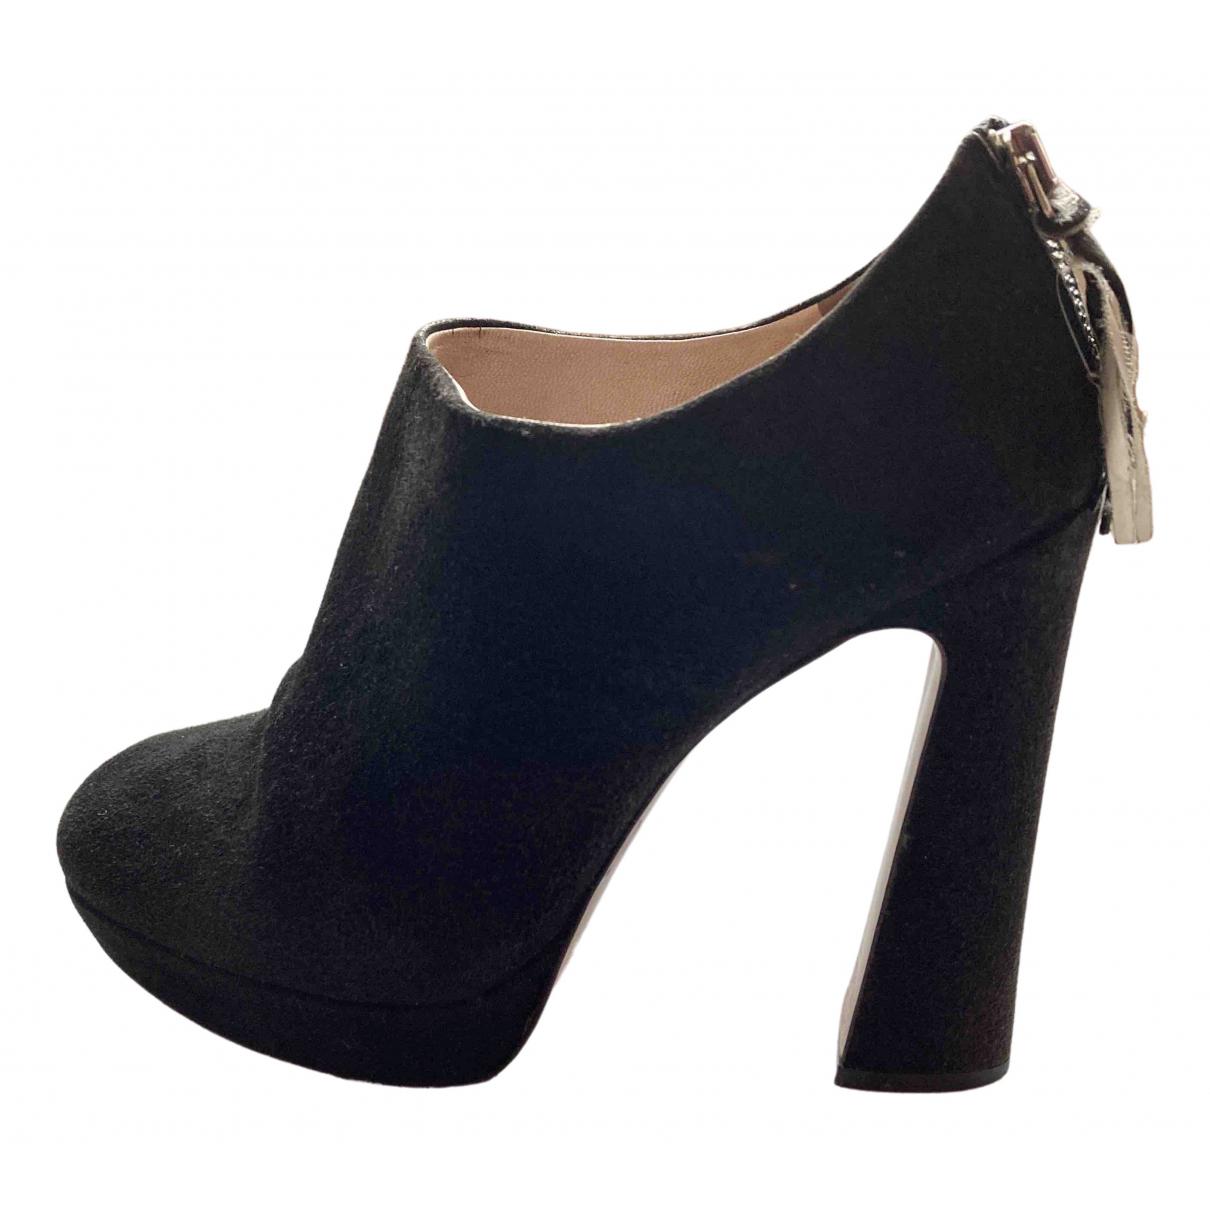 Miu Miu \N Black Suede Ankle boots for Women 40 EU